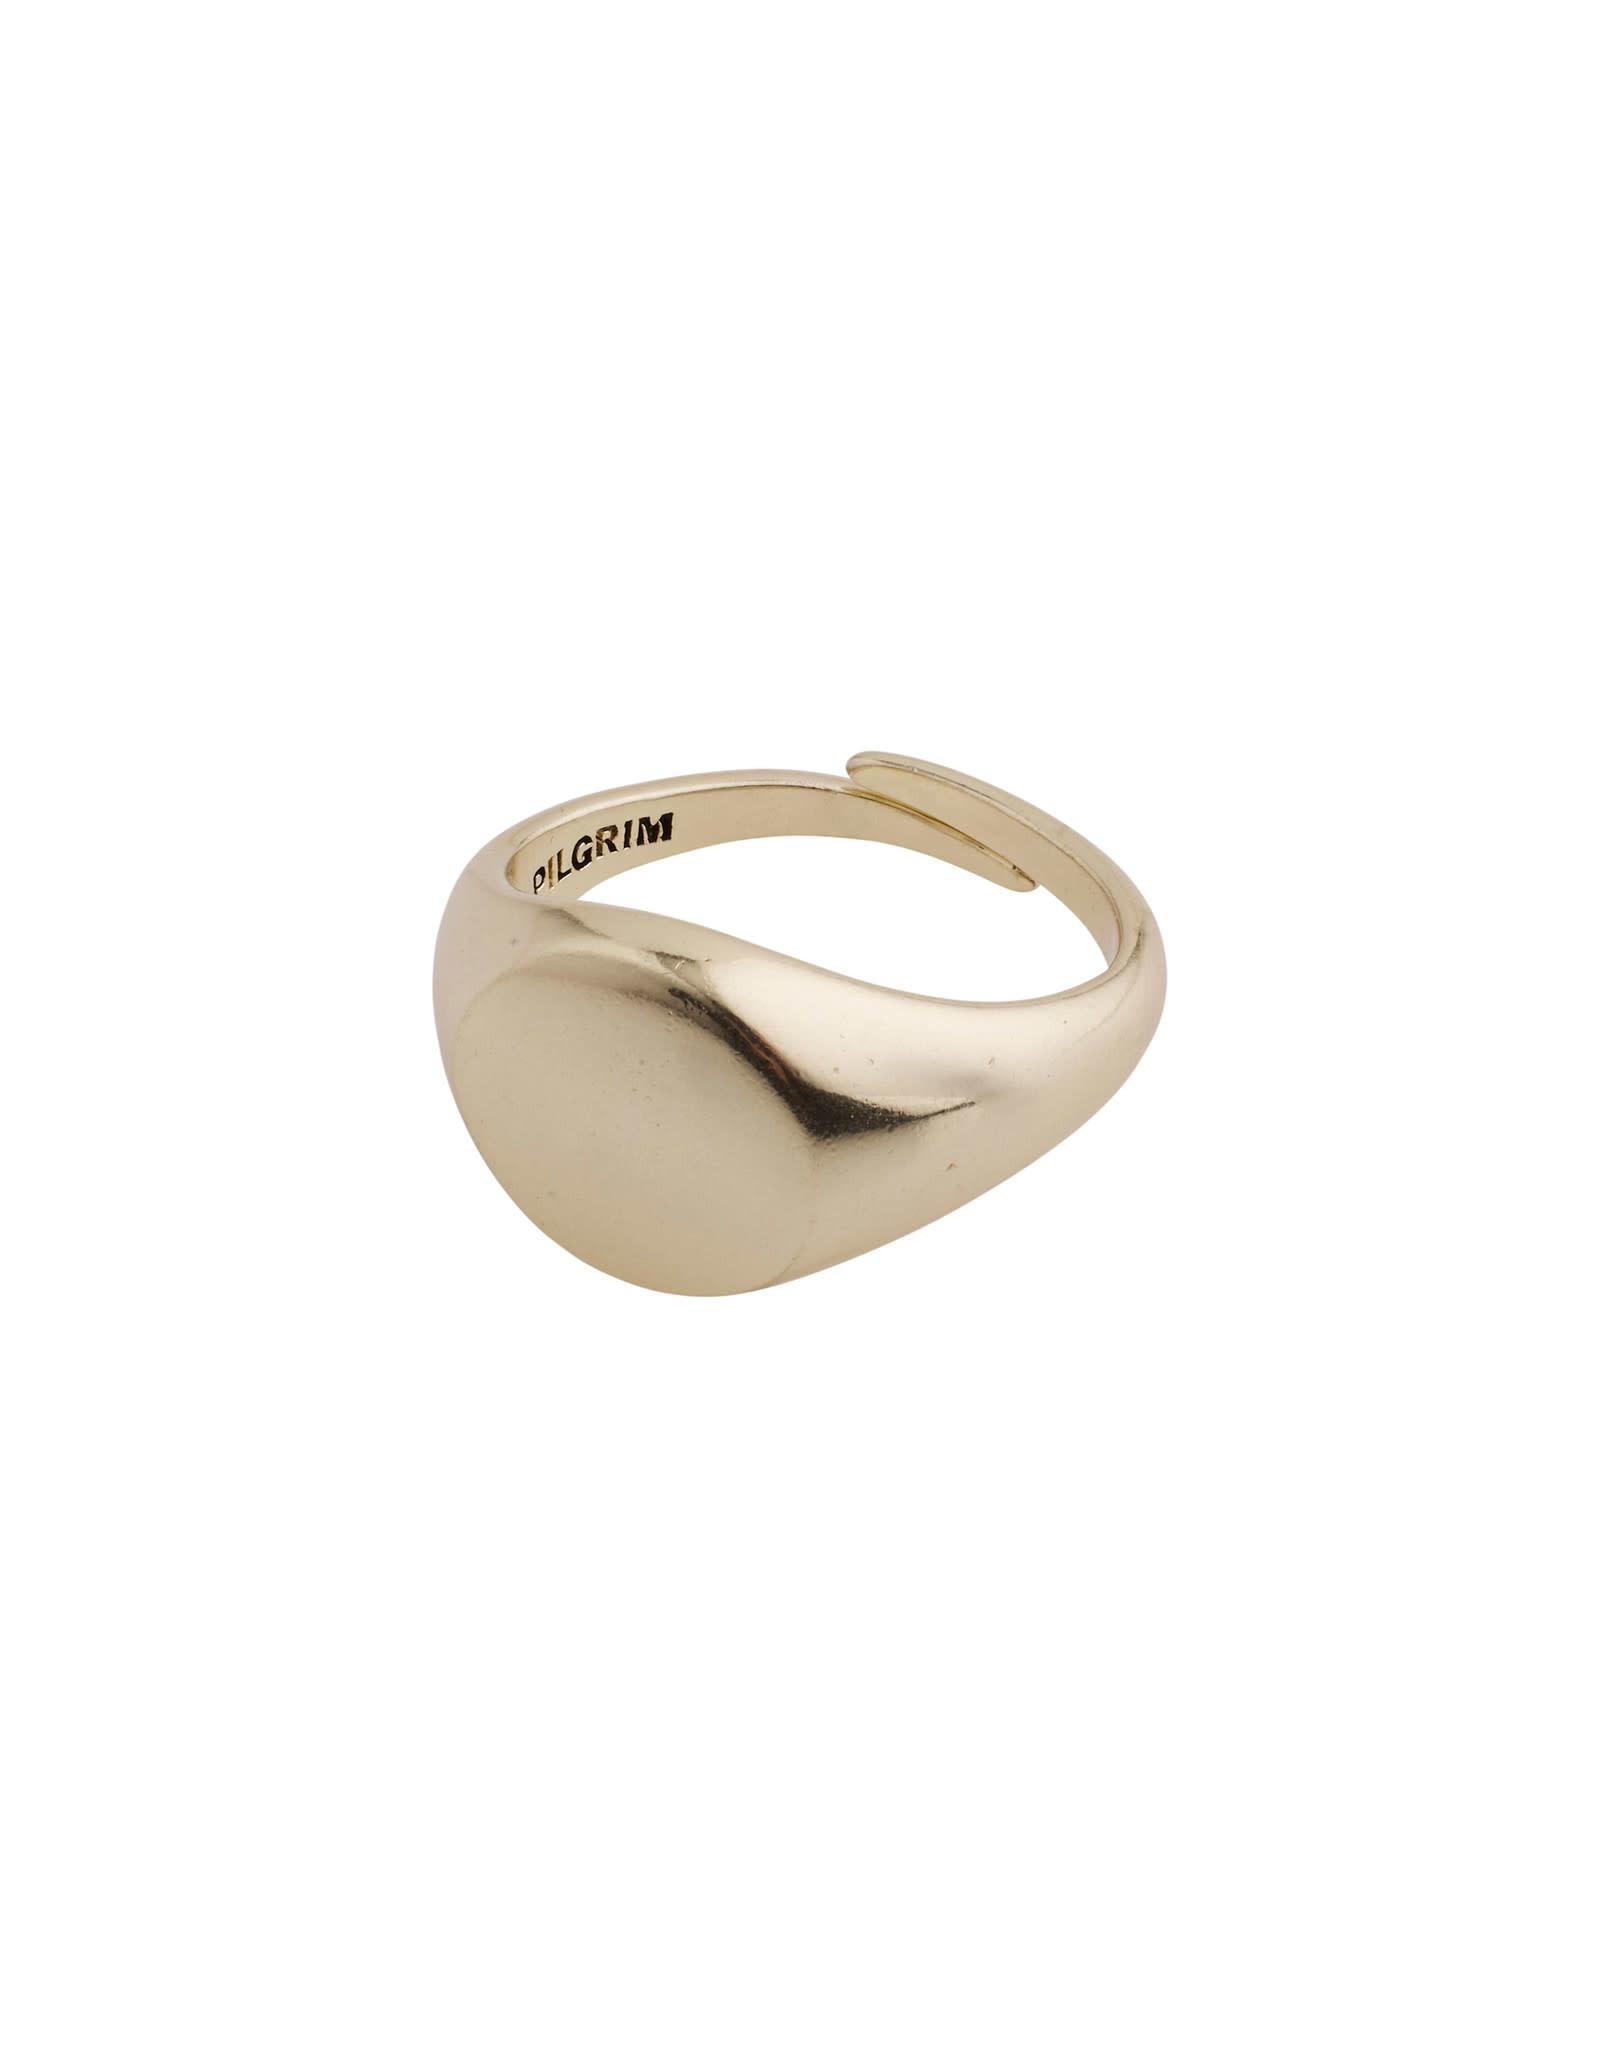 Pilgrim Sensitivity Ring - Gold Plated